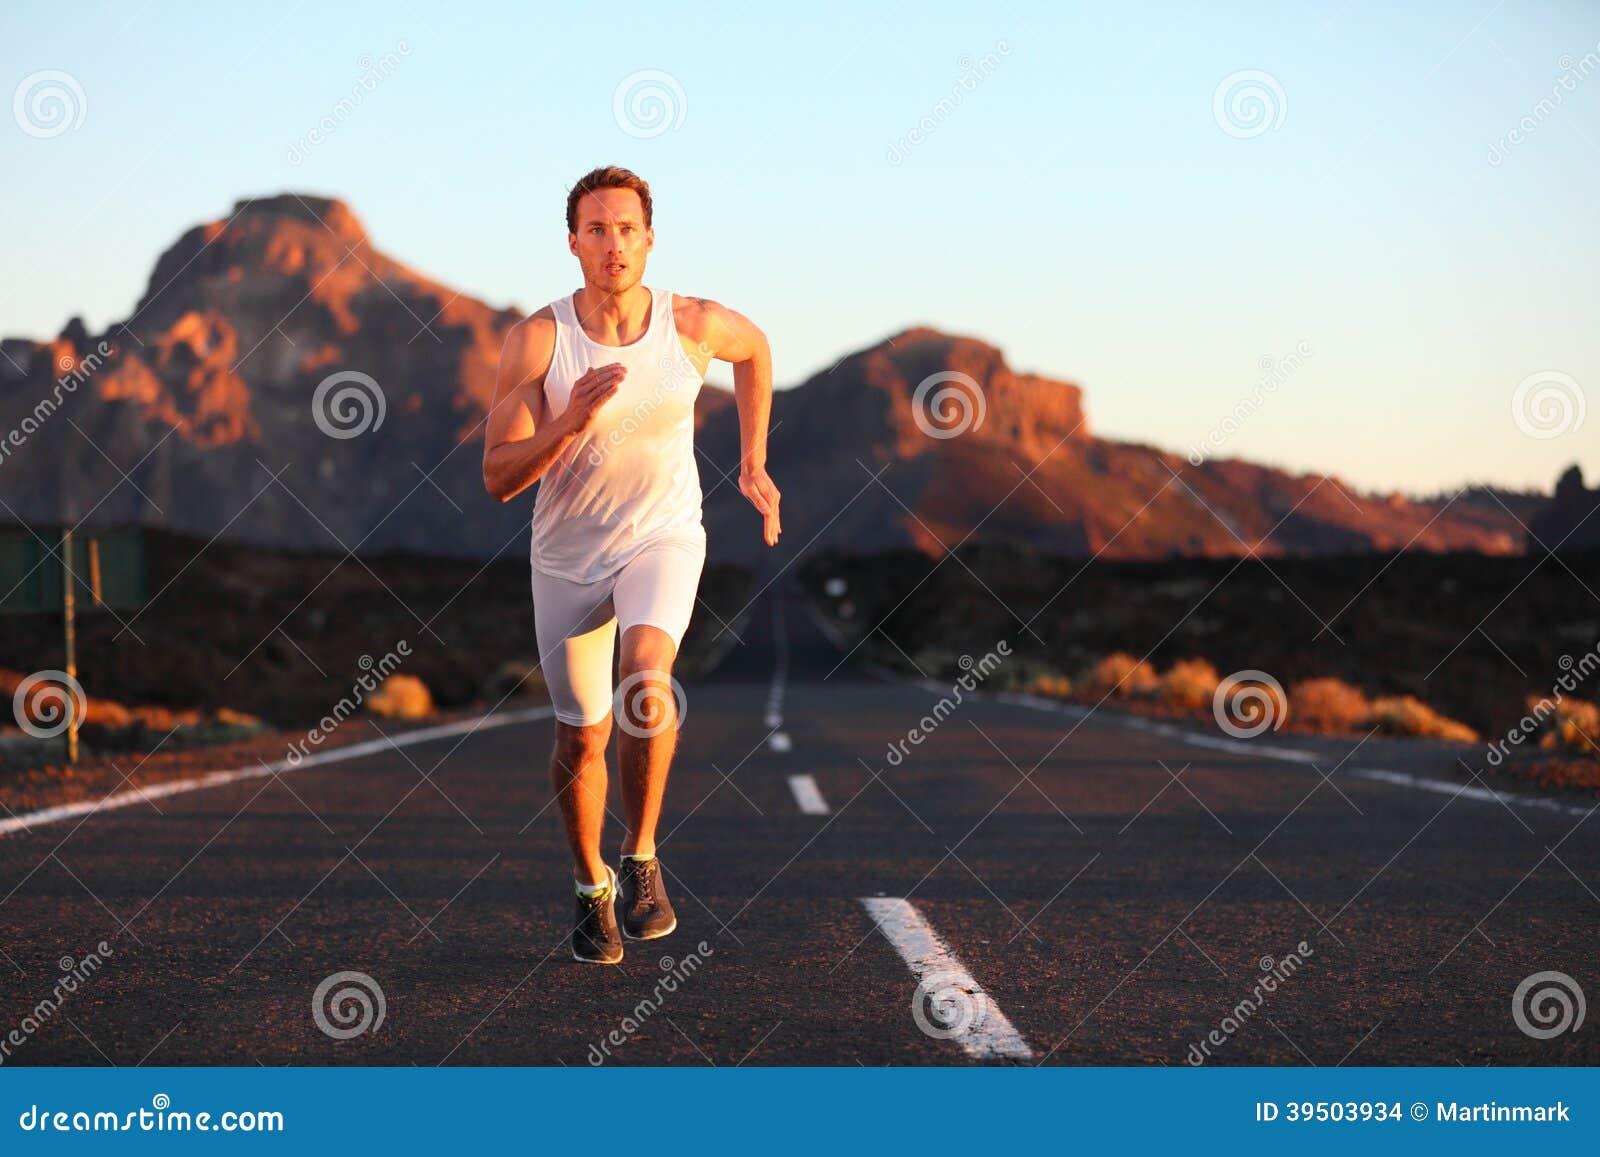 Athlete running sprinting at sunset on road